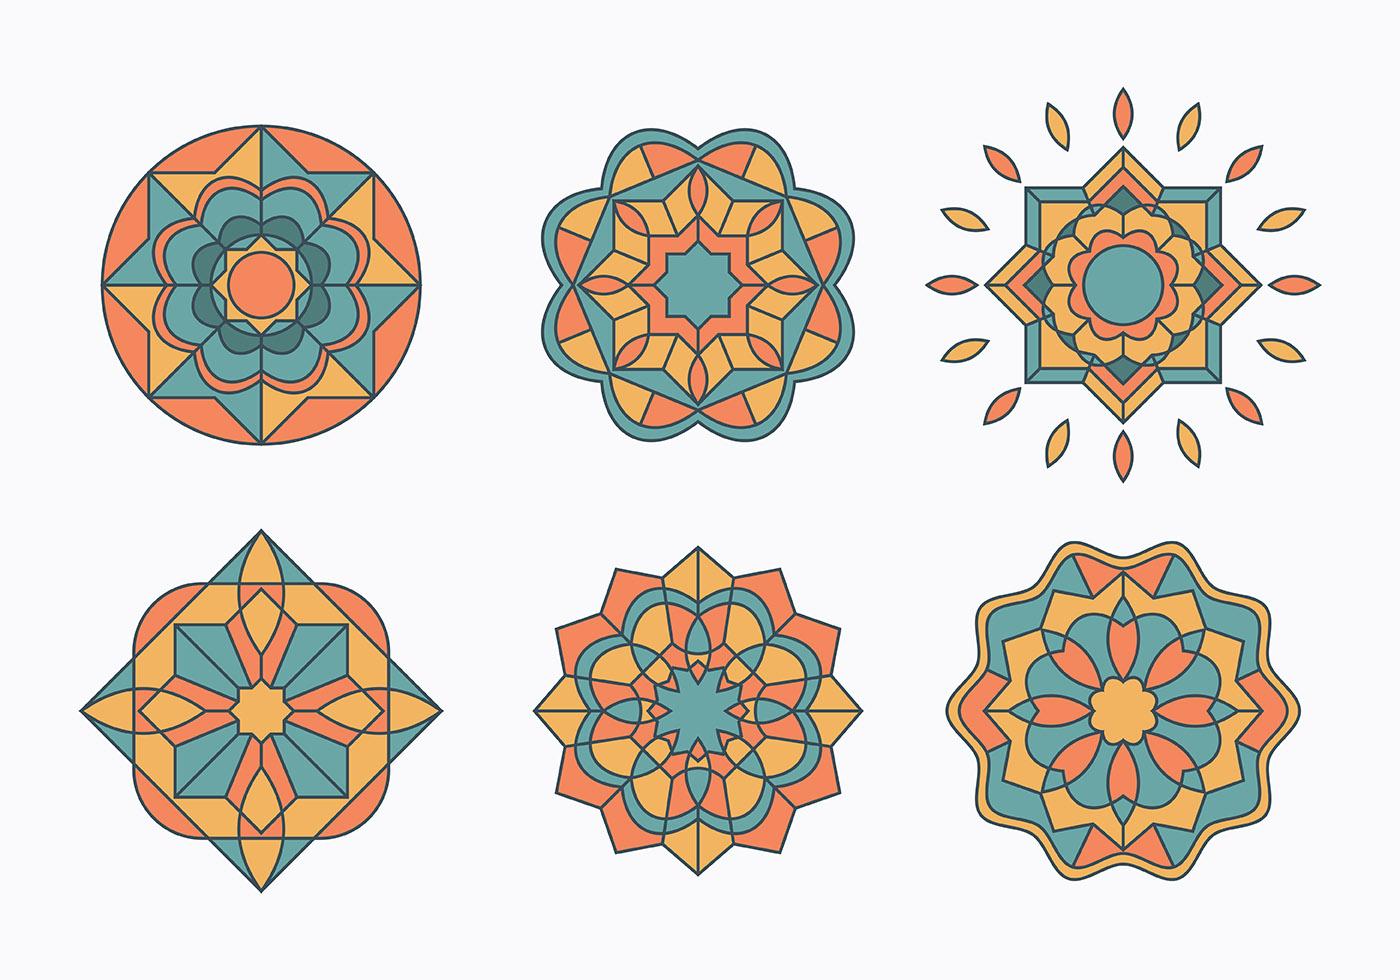 Islamic Ornaments Set  Download Free Vector Art Stock Graphics  Images